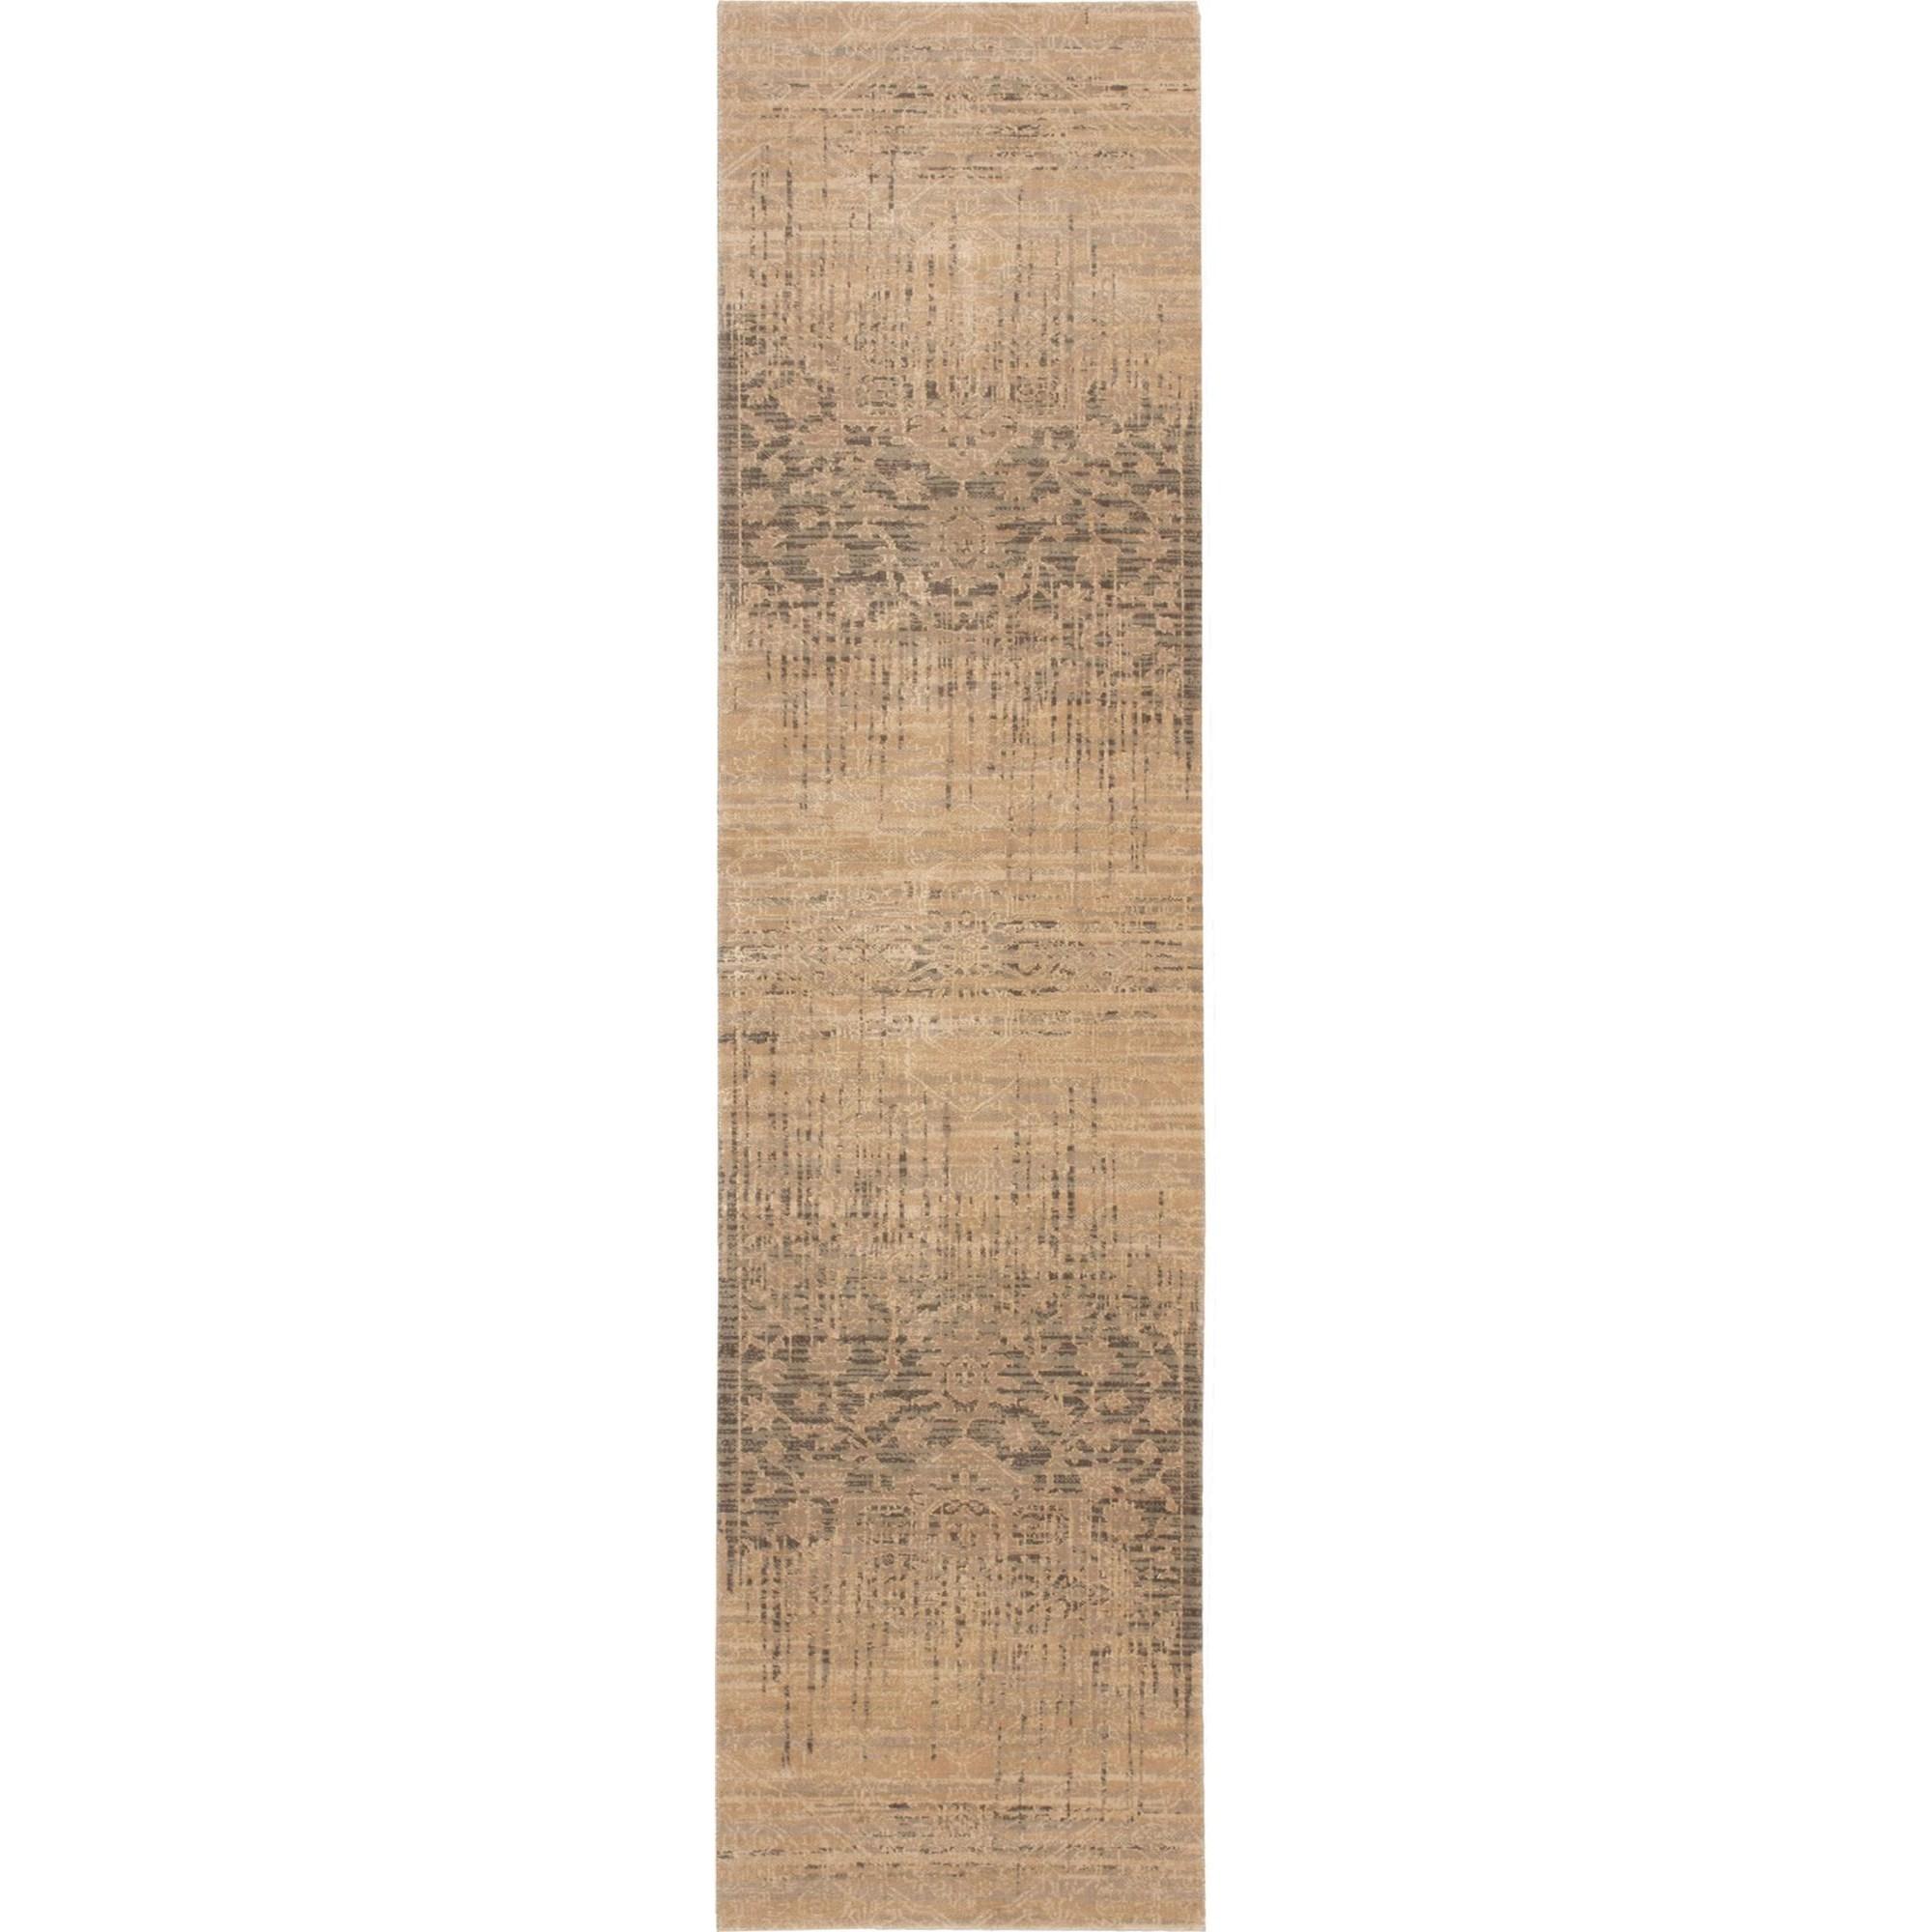 "Nourison Silk Elements 2'5"" x 10' Beige Area Rug - Item Number: 18860"